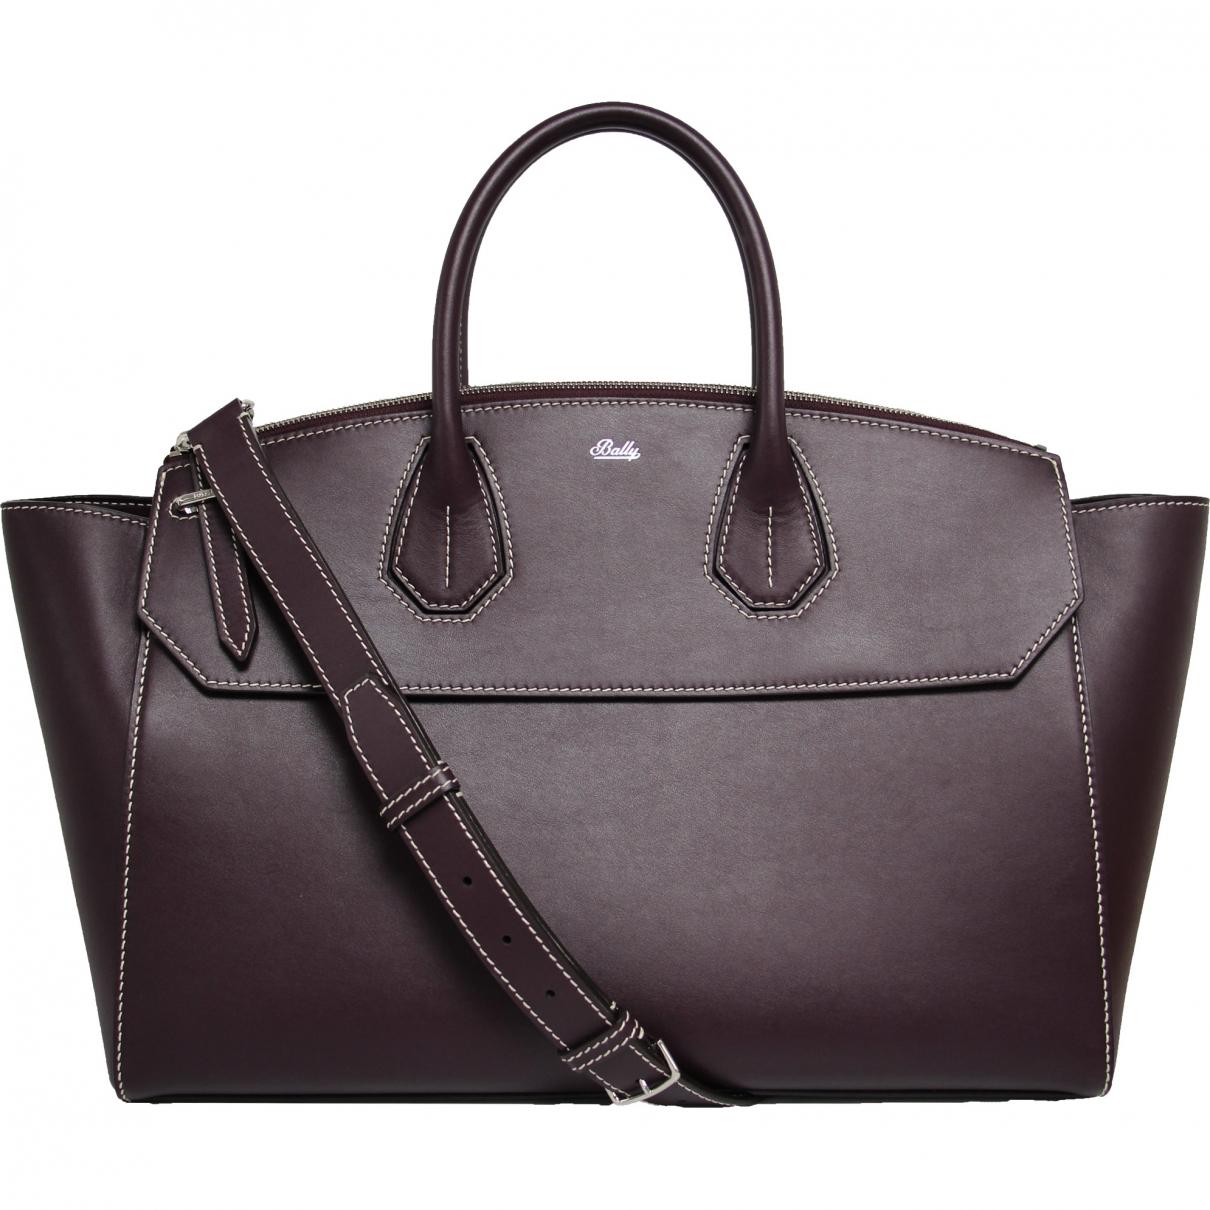 Bally \N Purple Leather handbag for Women \N